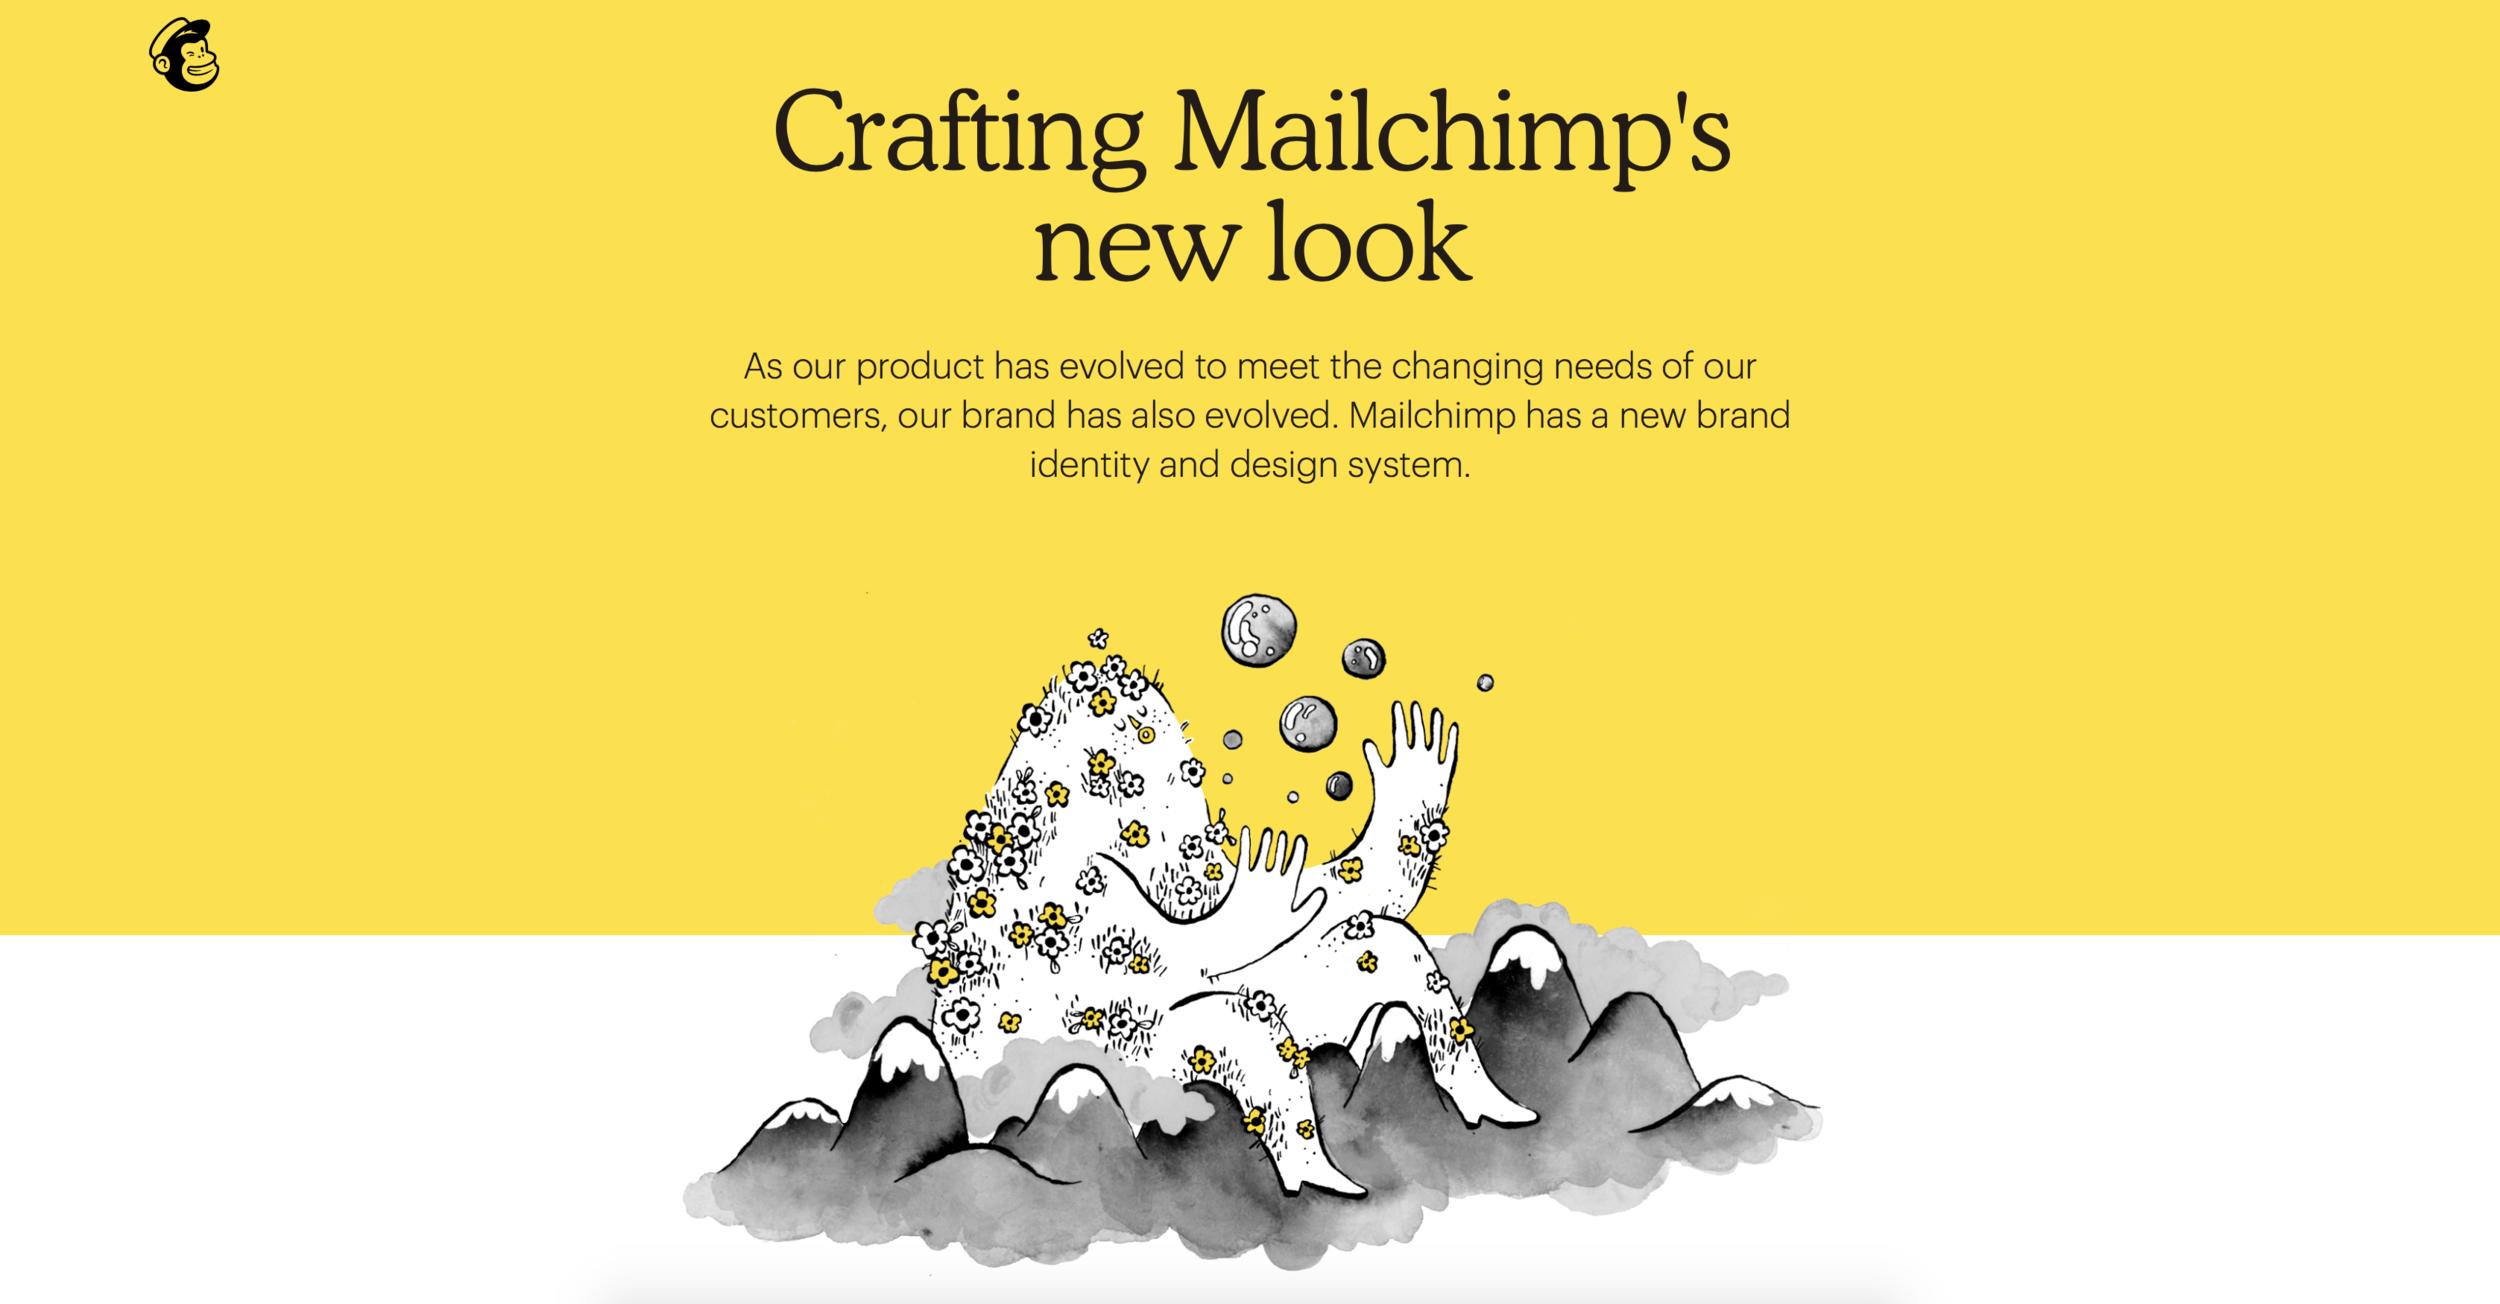 Mailchimp Design   Crafting Mailchimp's New Look